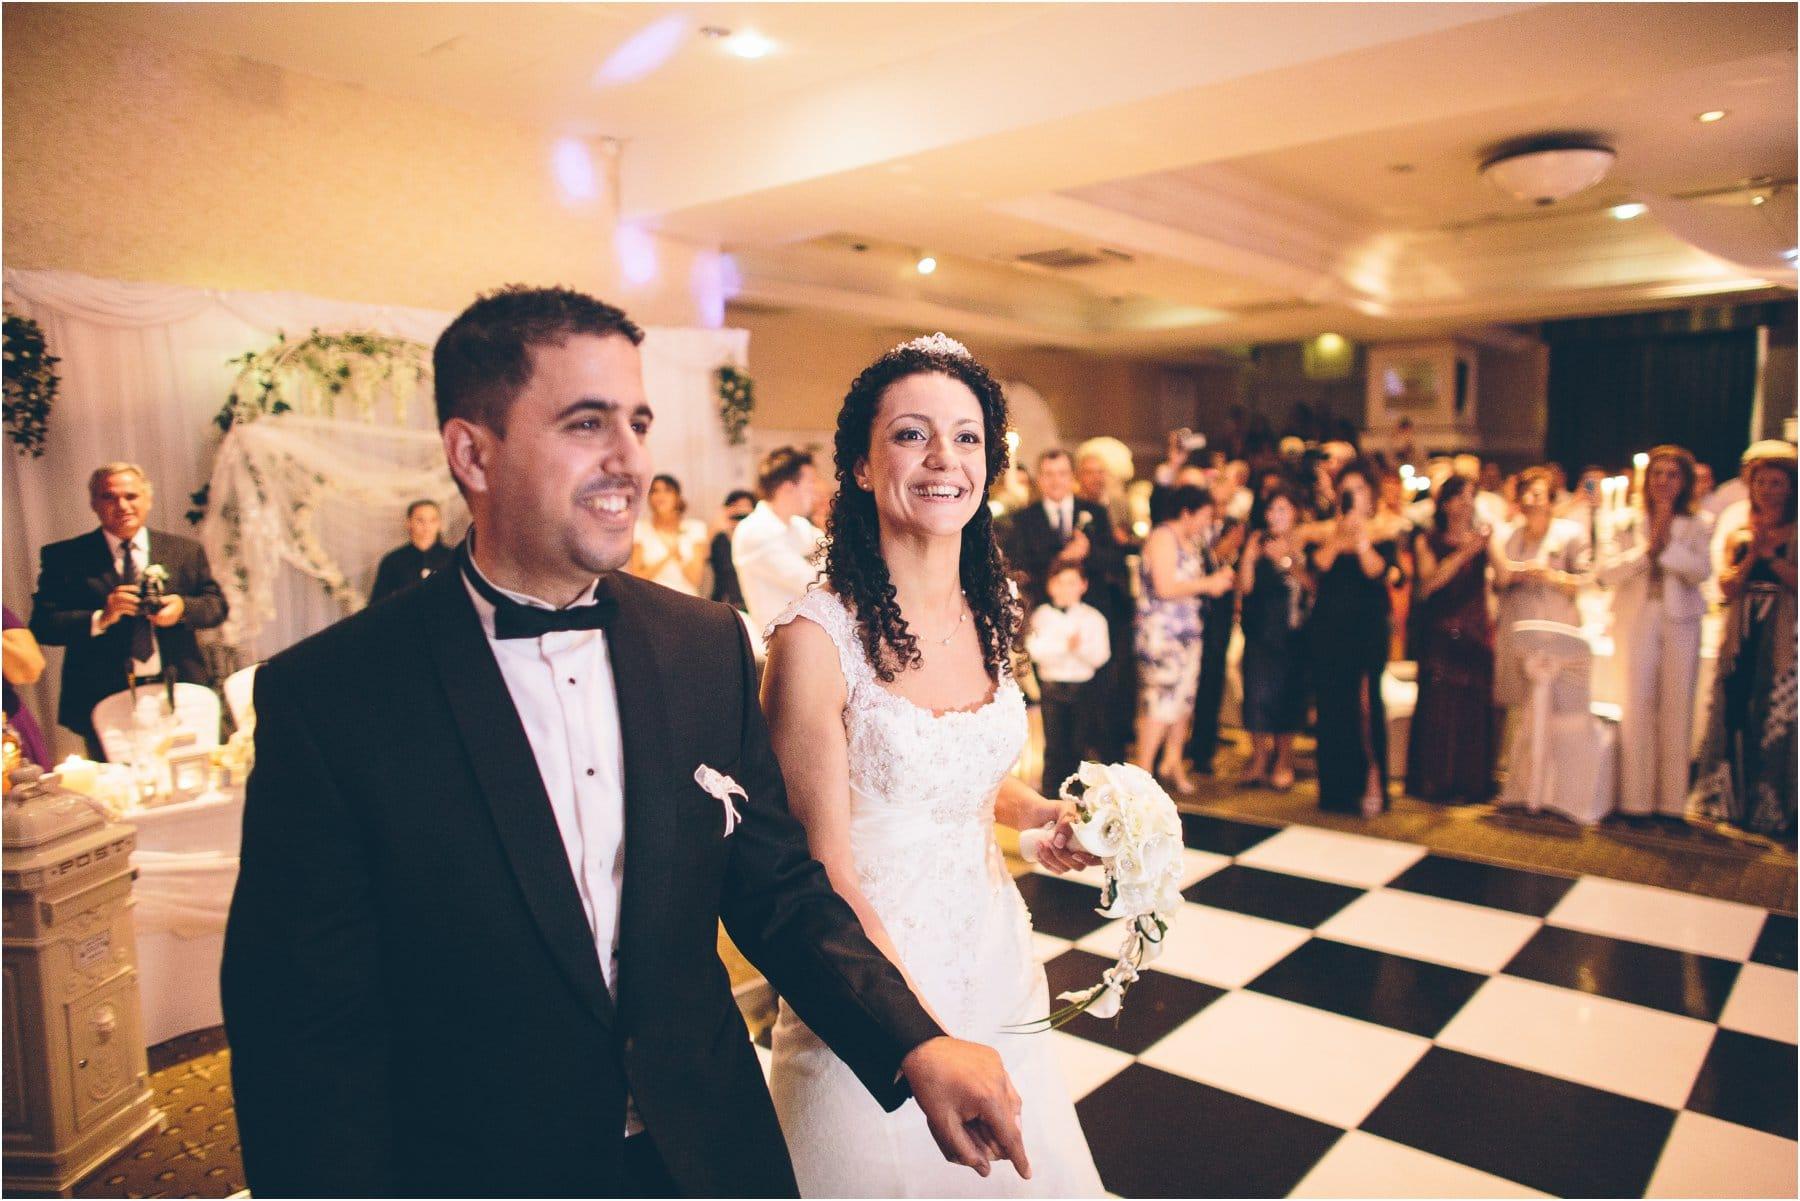 Midland_Manchester_Wedding_Photography_0096